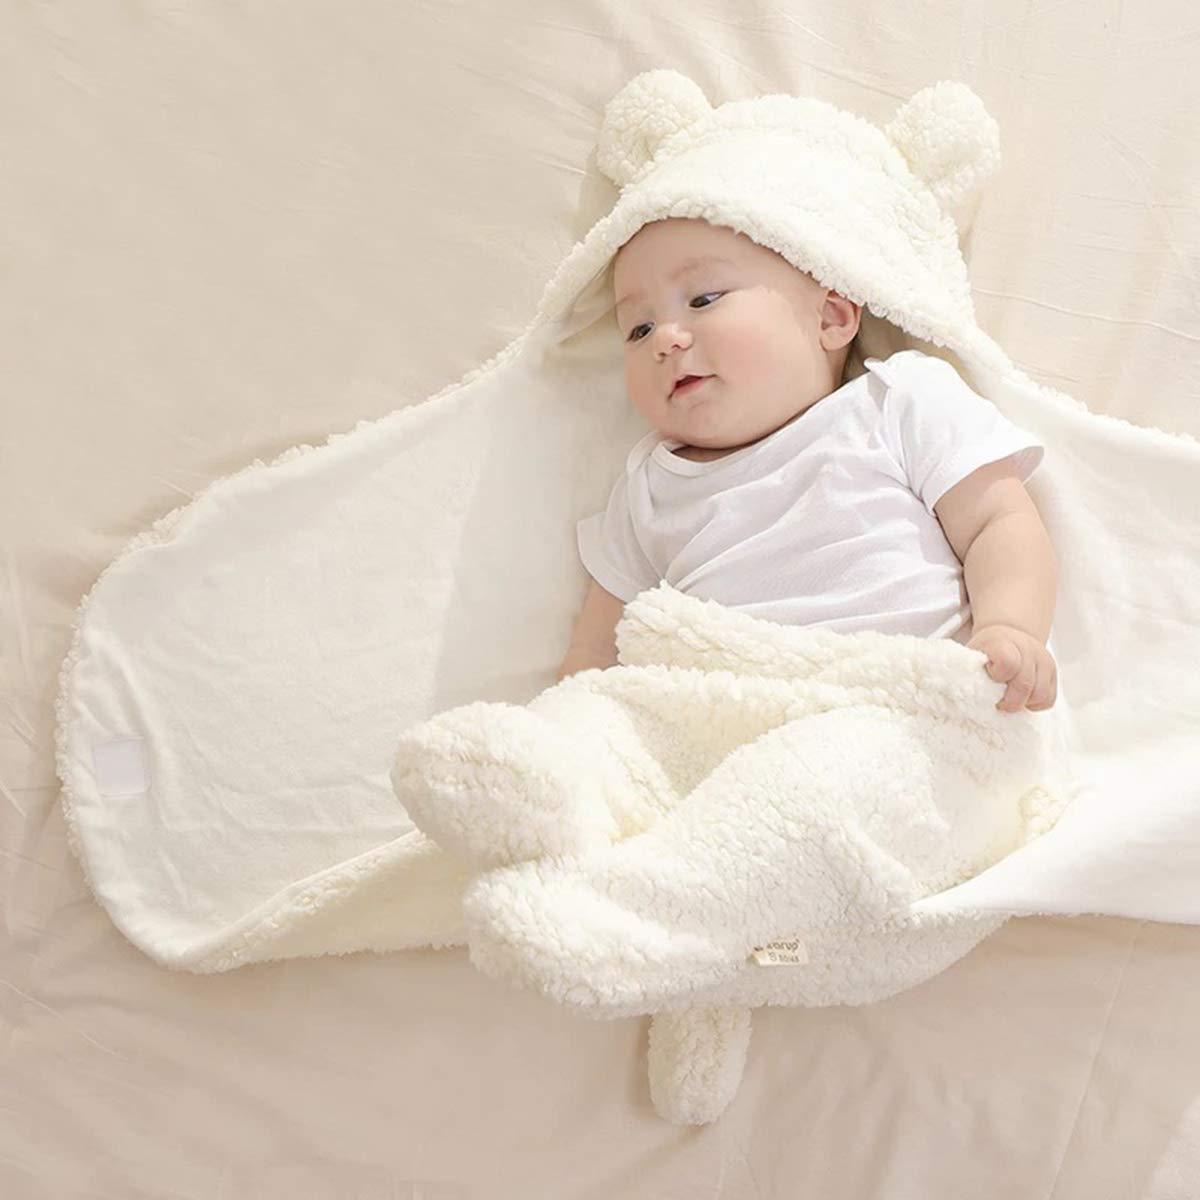 Newborn Cotton Plush Hooded Blanket Warm Soft Swaddle Sleeping Bag Stroller Wrap Clothes Sleeping Bags